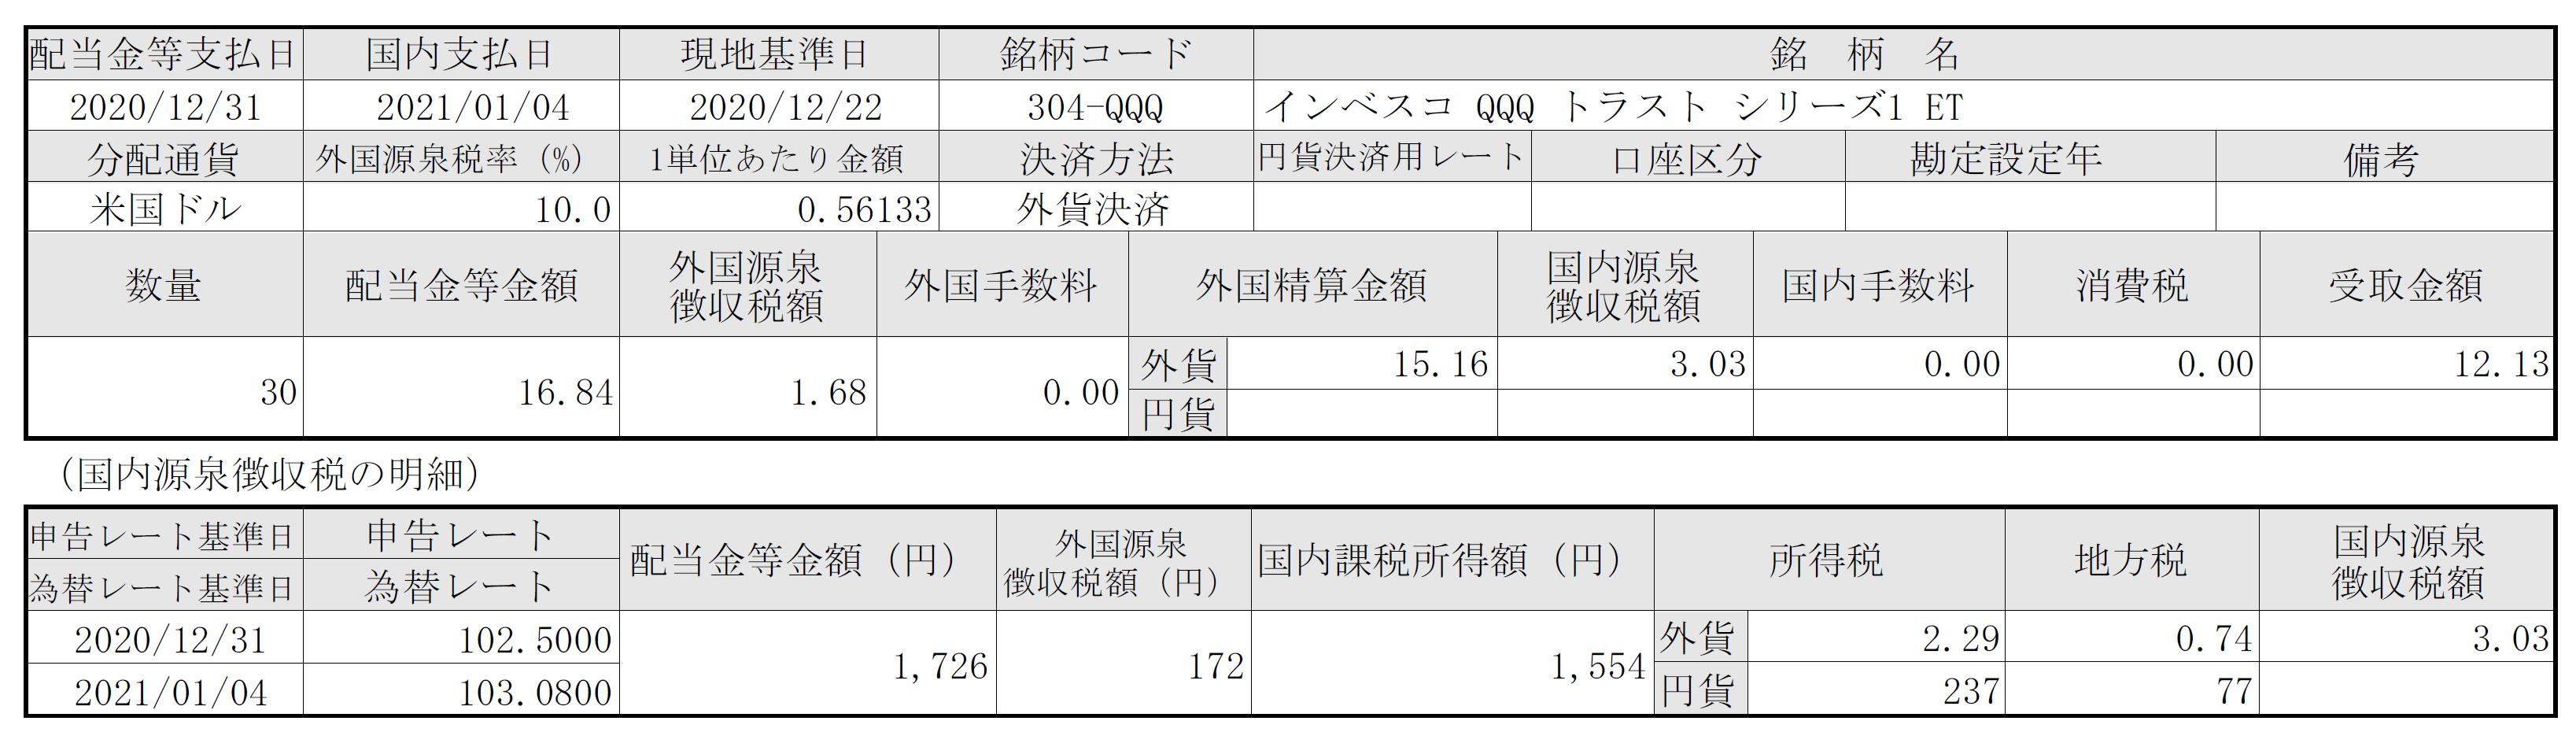 f:id:hodo-work:20210112115142p:plain